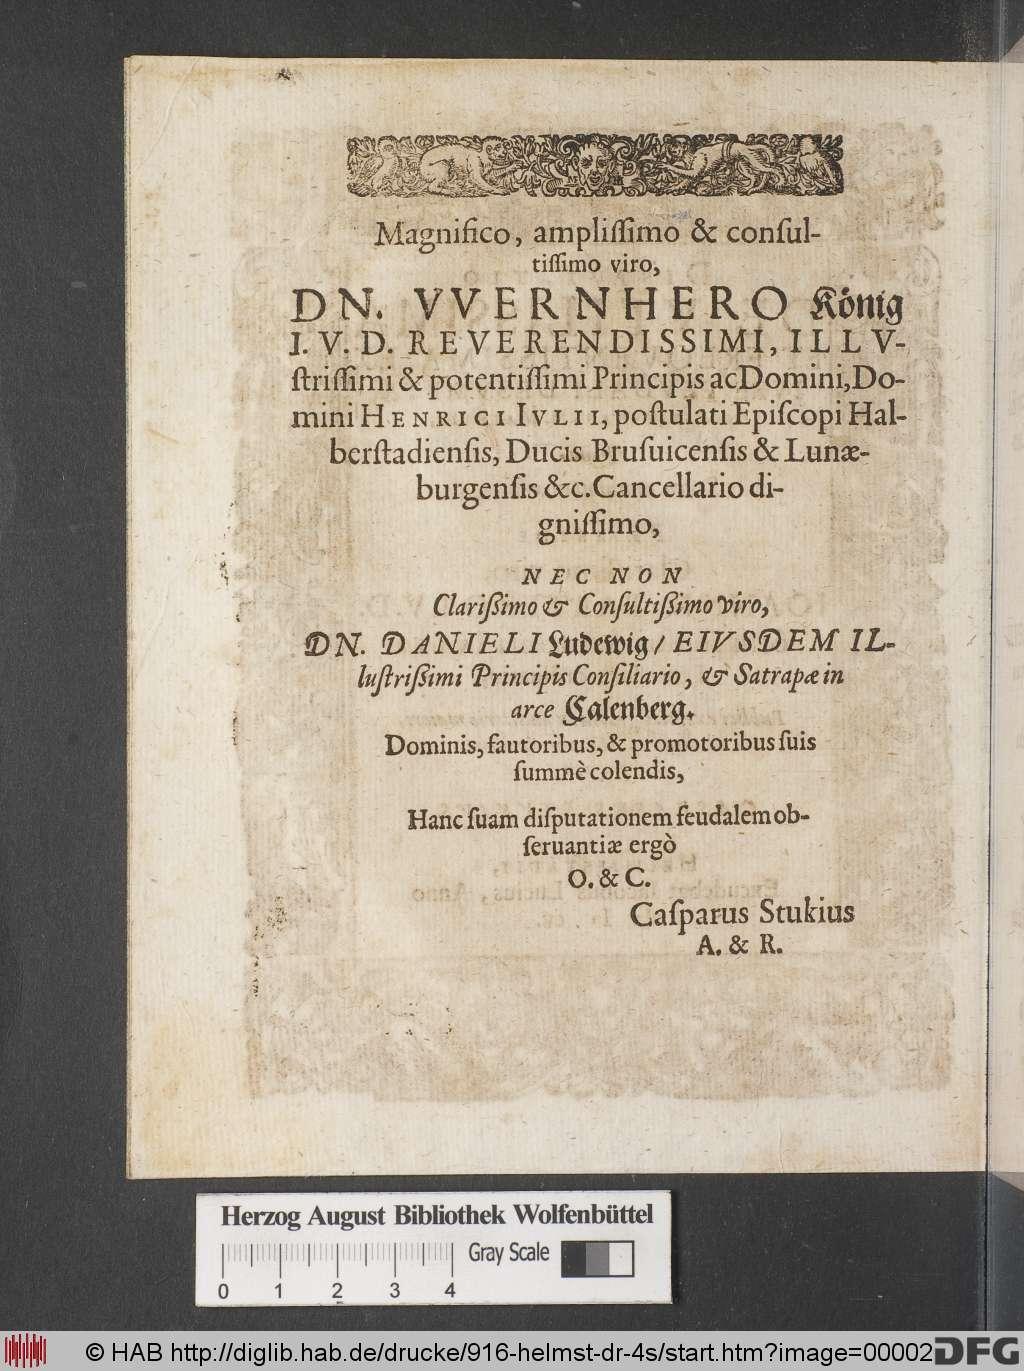 http://diglib.hab.de/drucke/916-helmst-dr-4s/00002.jpg